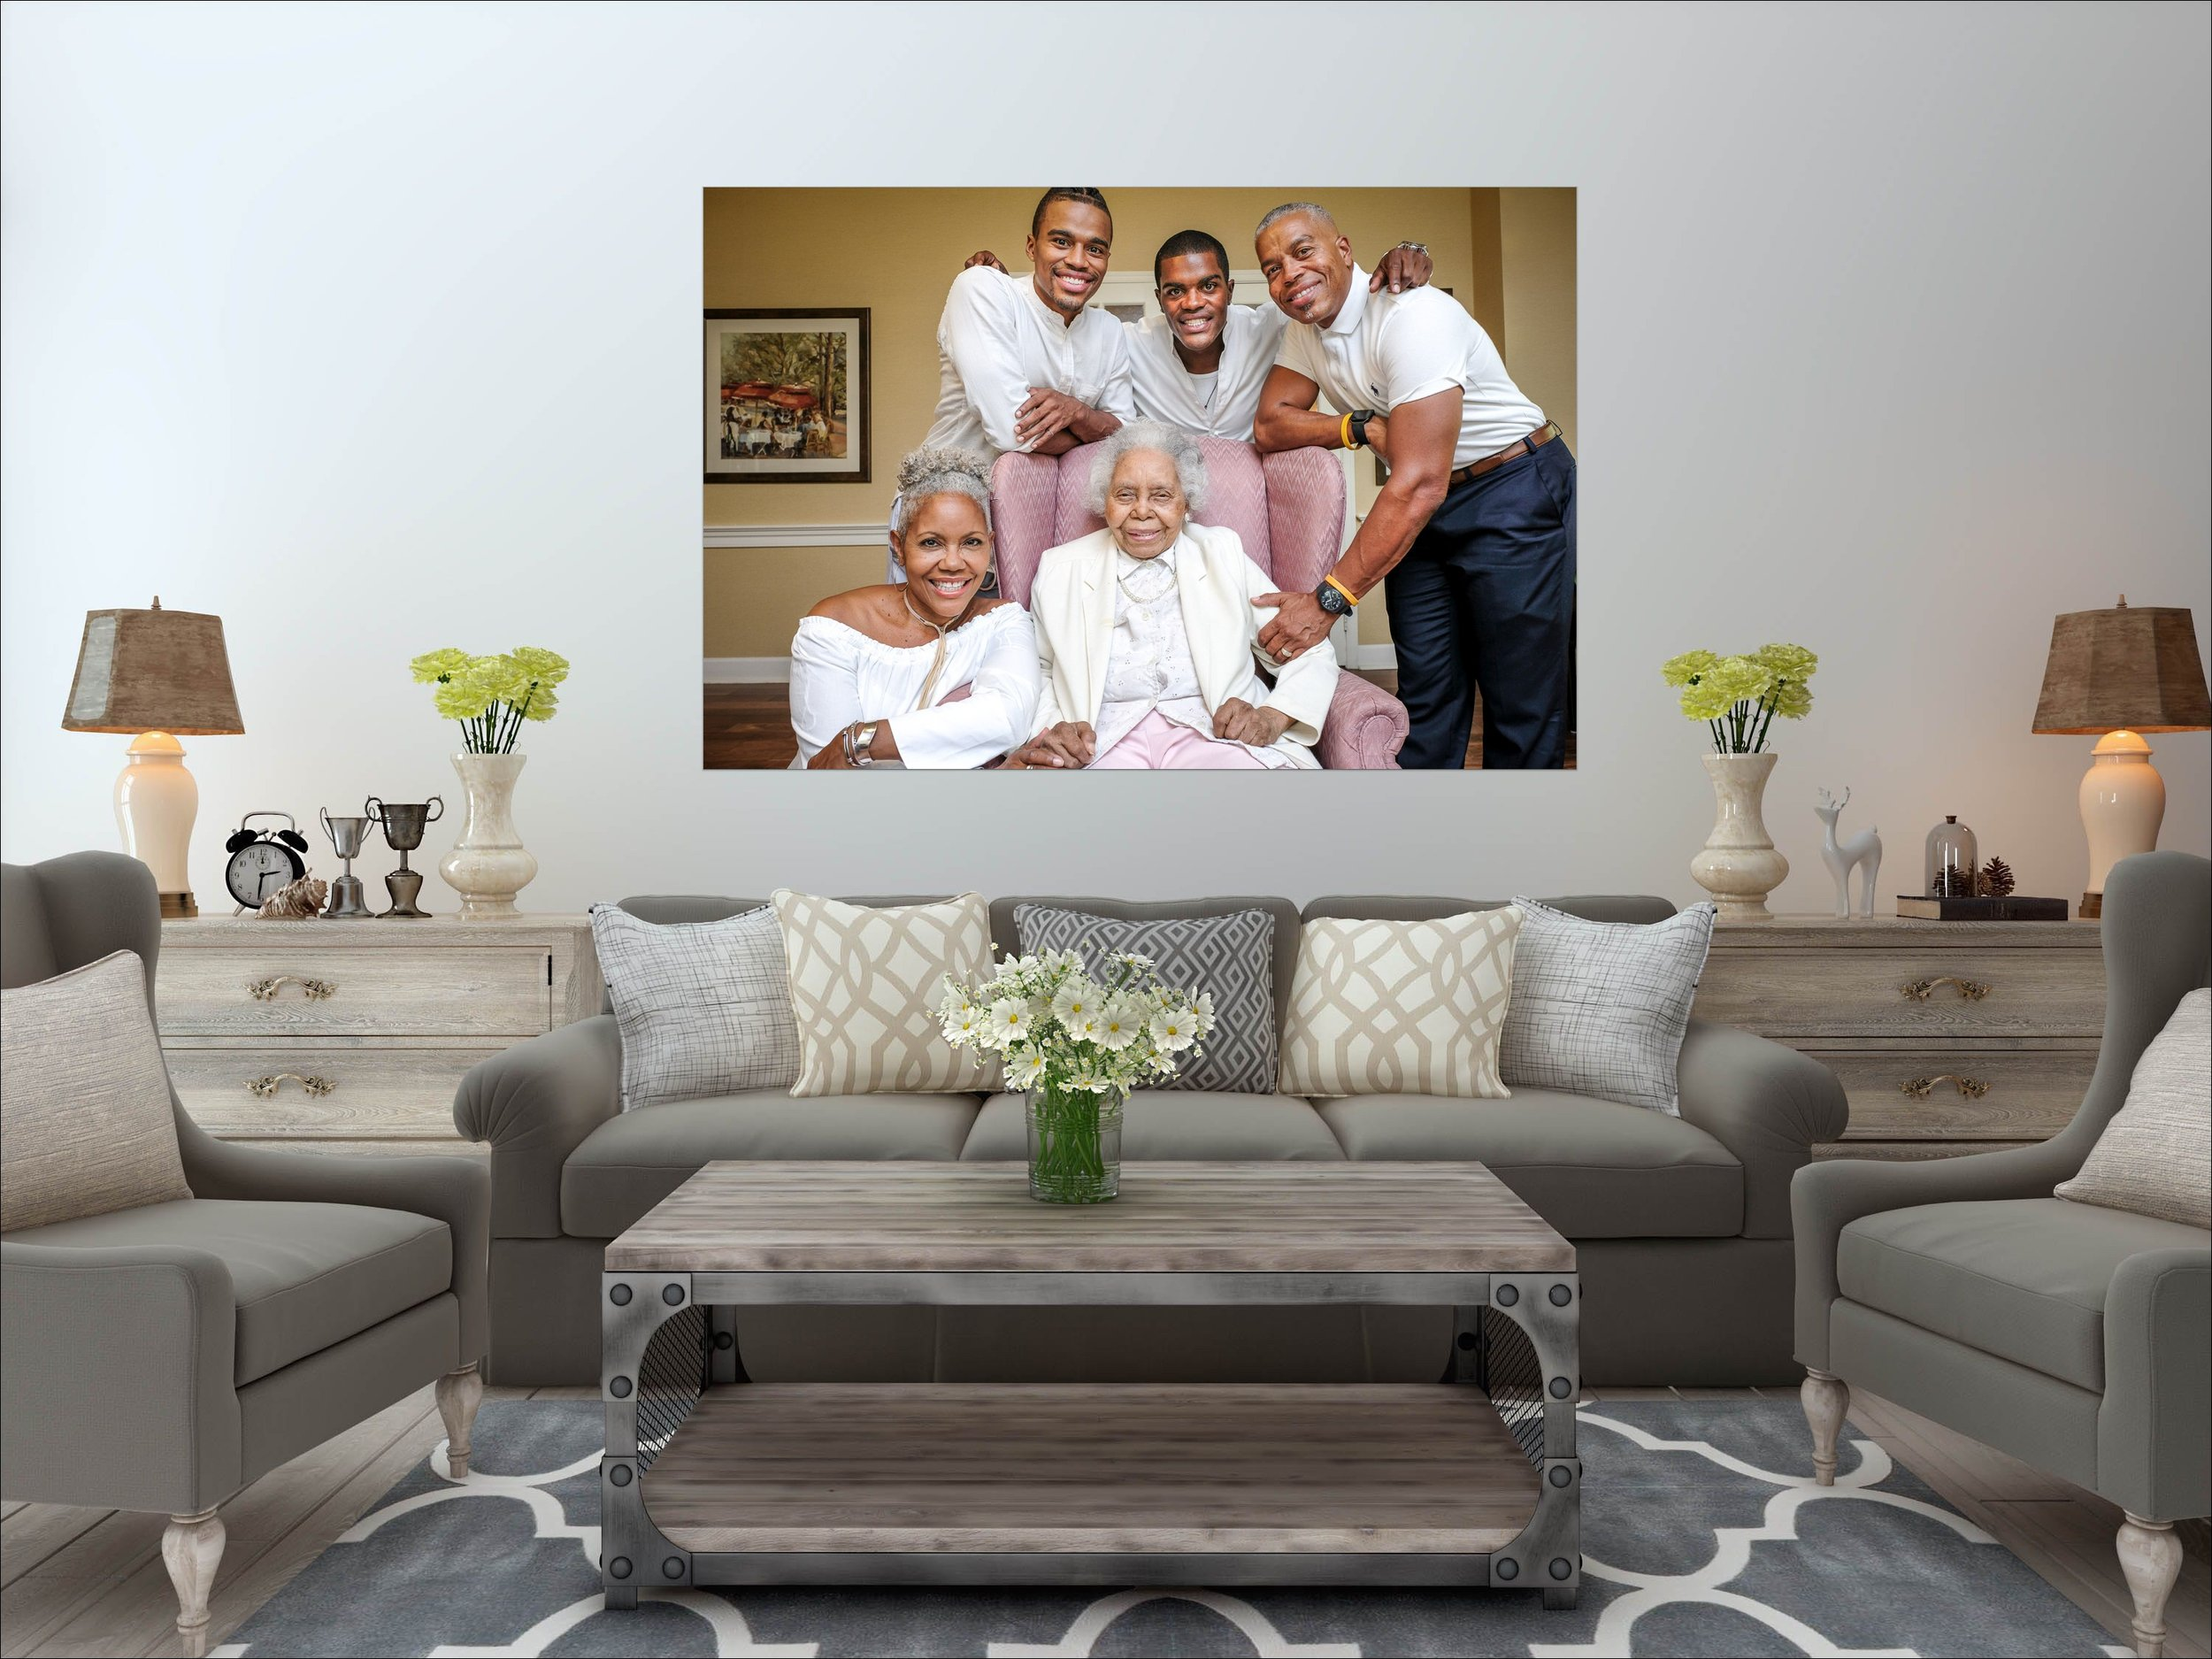 cute_family_pictures_family_photo_ideas_washington_dc.jpg